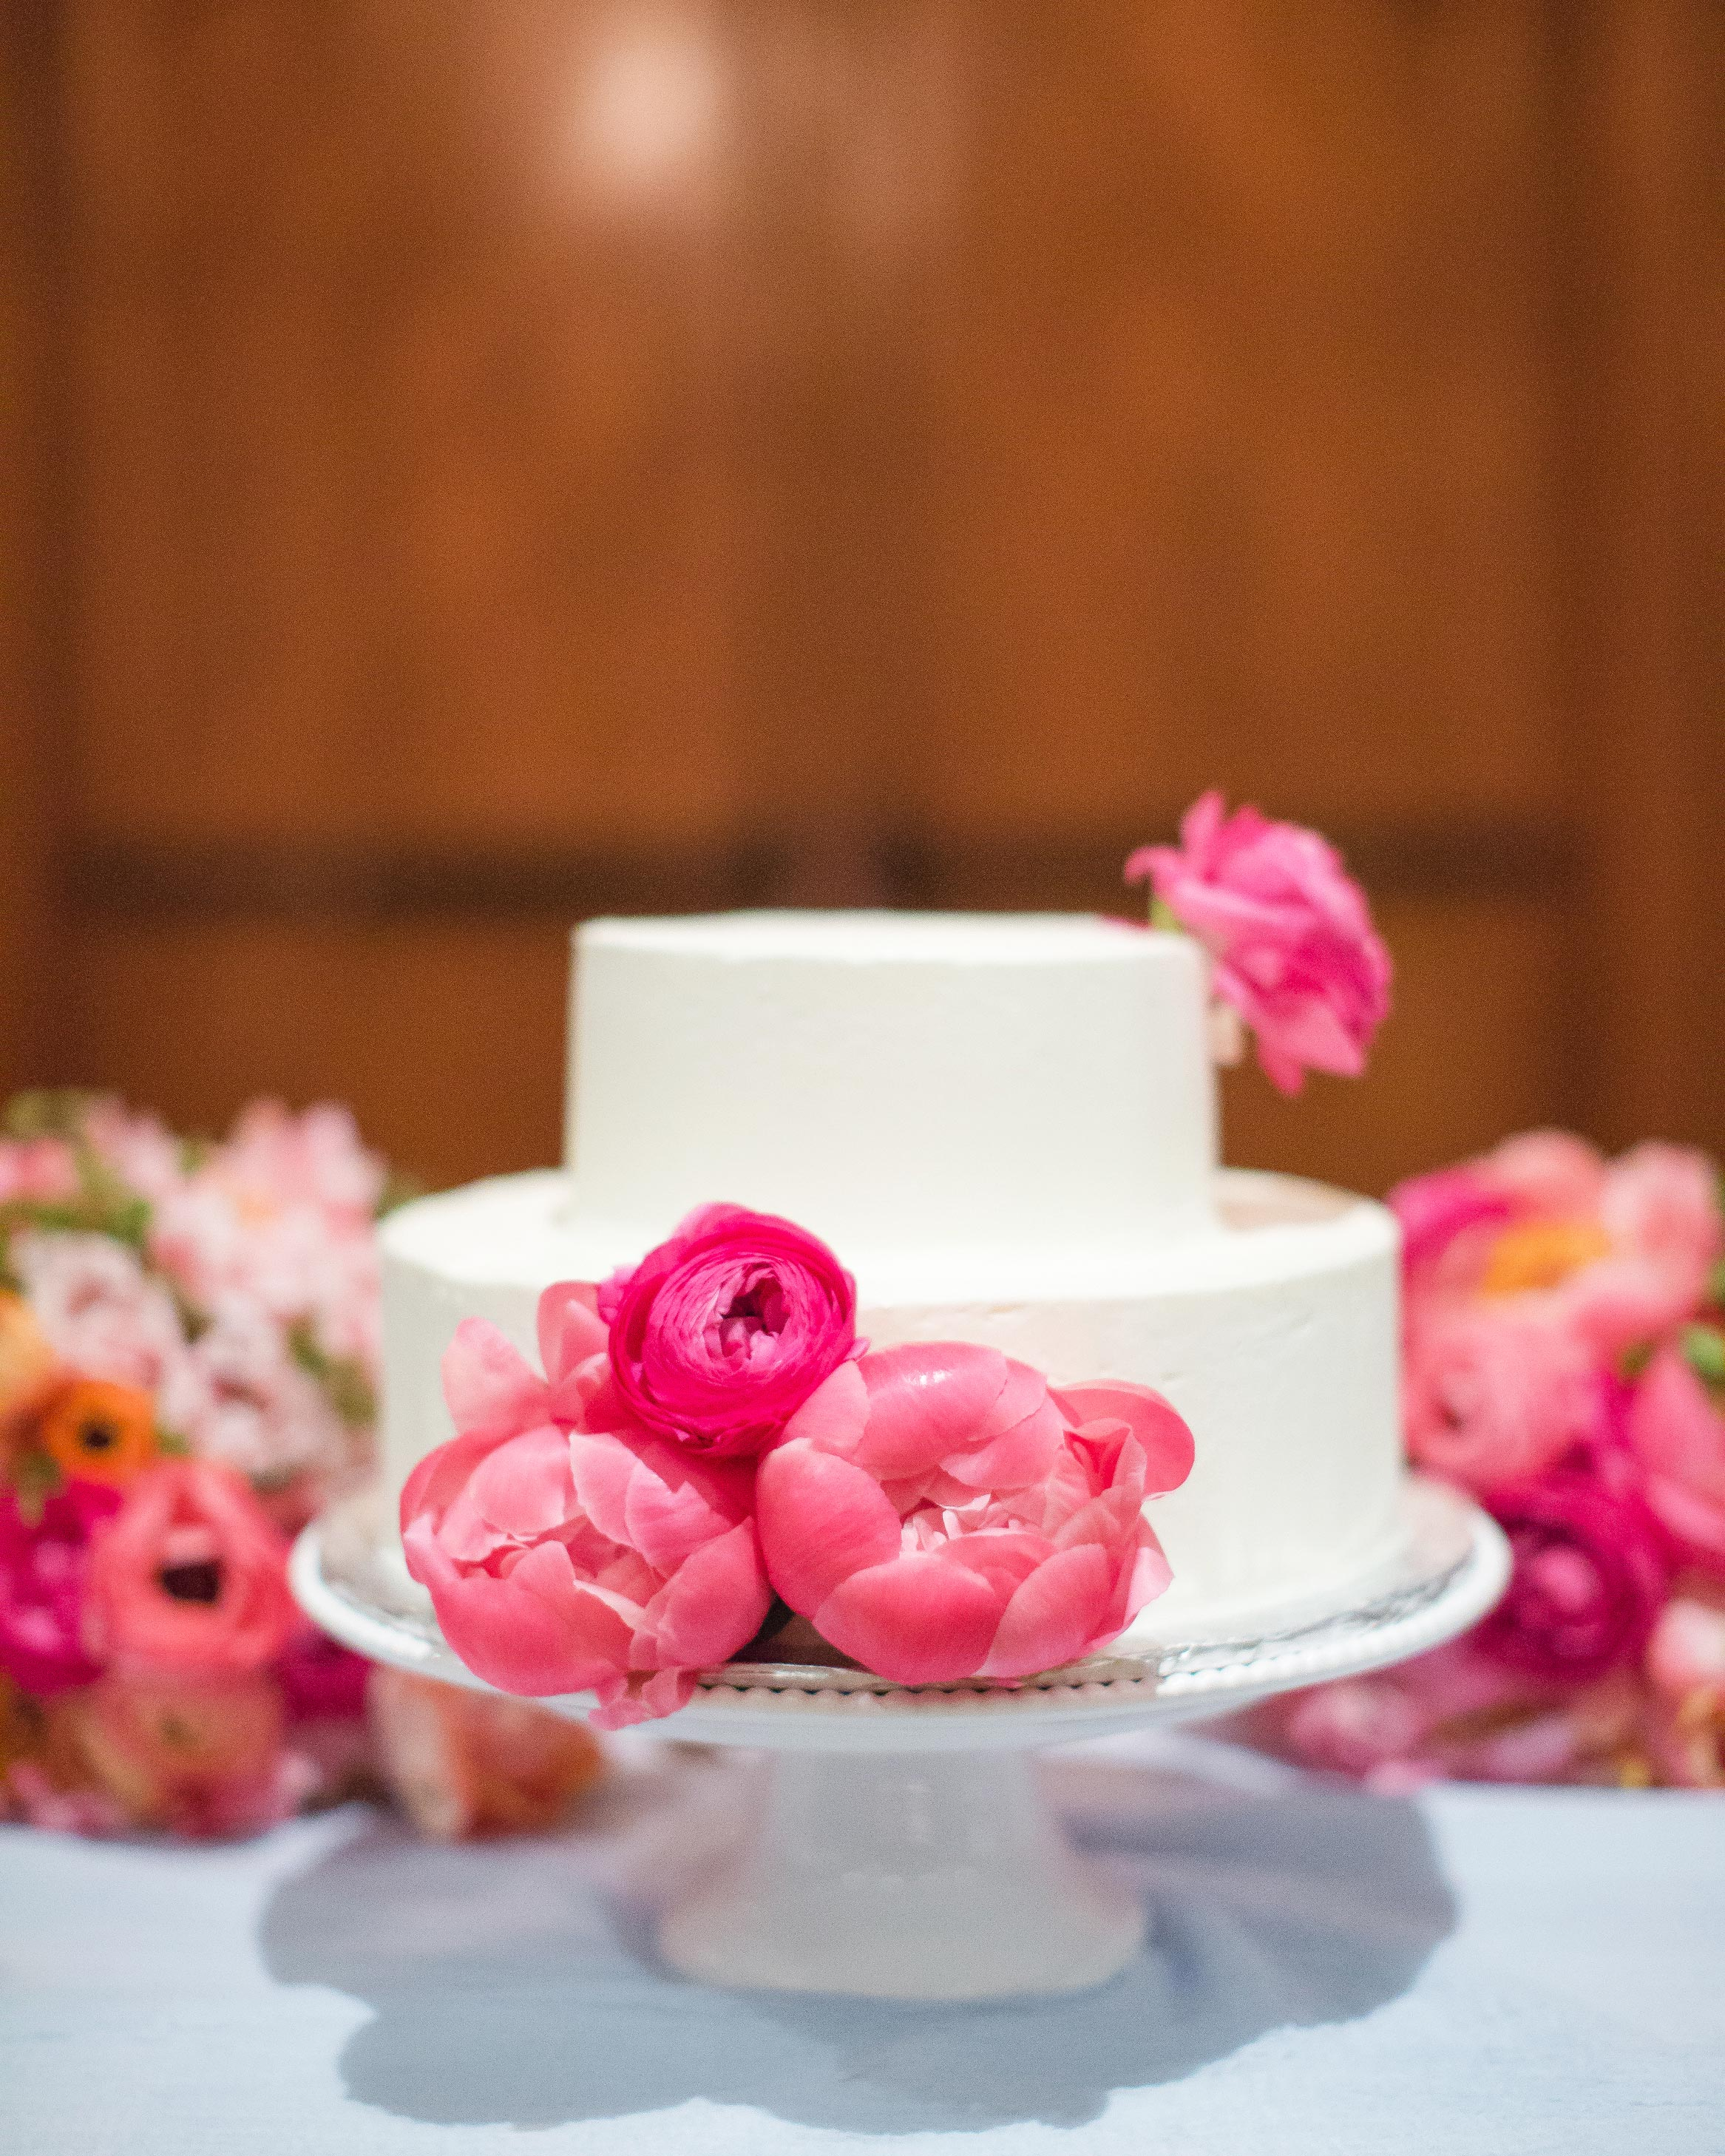 christen-tim-wedding-cake-22435-6143924-0816.jpg